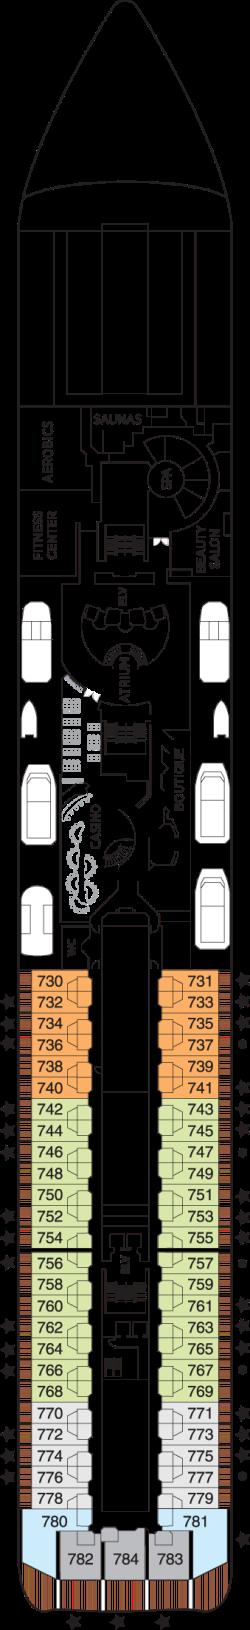 Seven Seas Mariner Deck 7: Deck 7